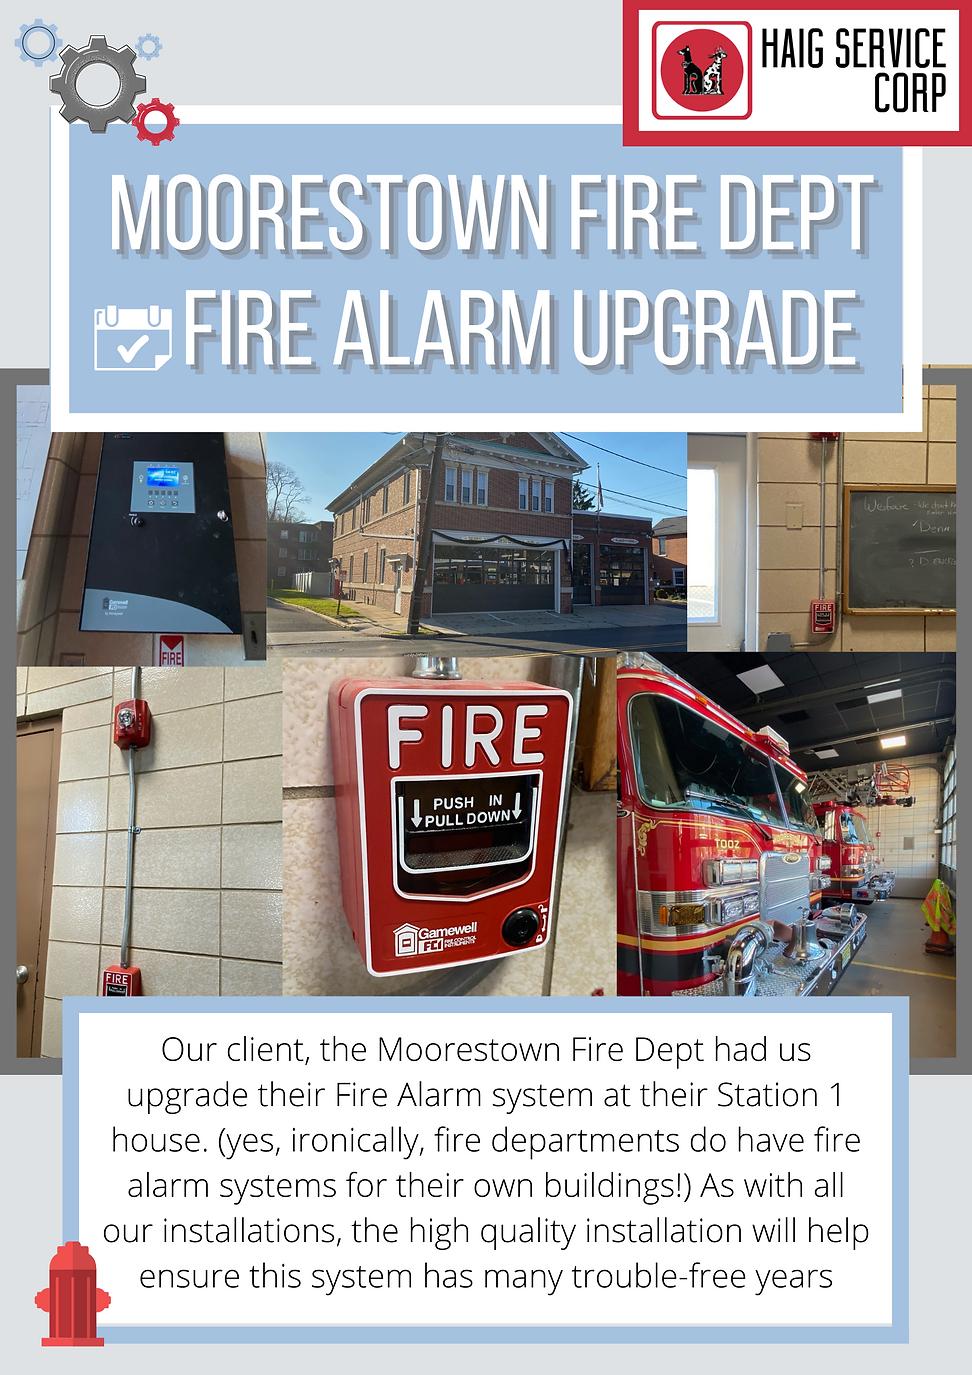 Moorestown Fire Dept.png